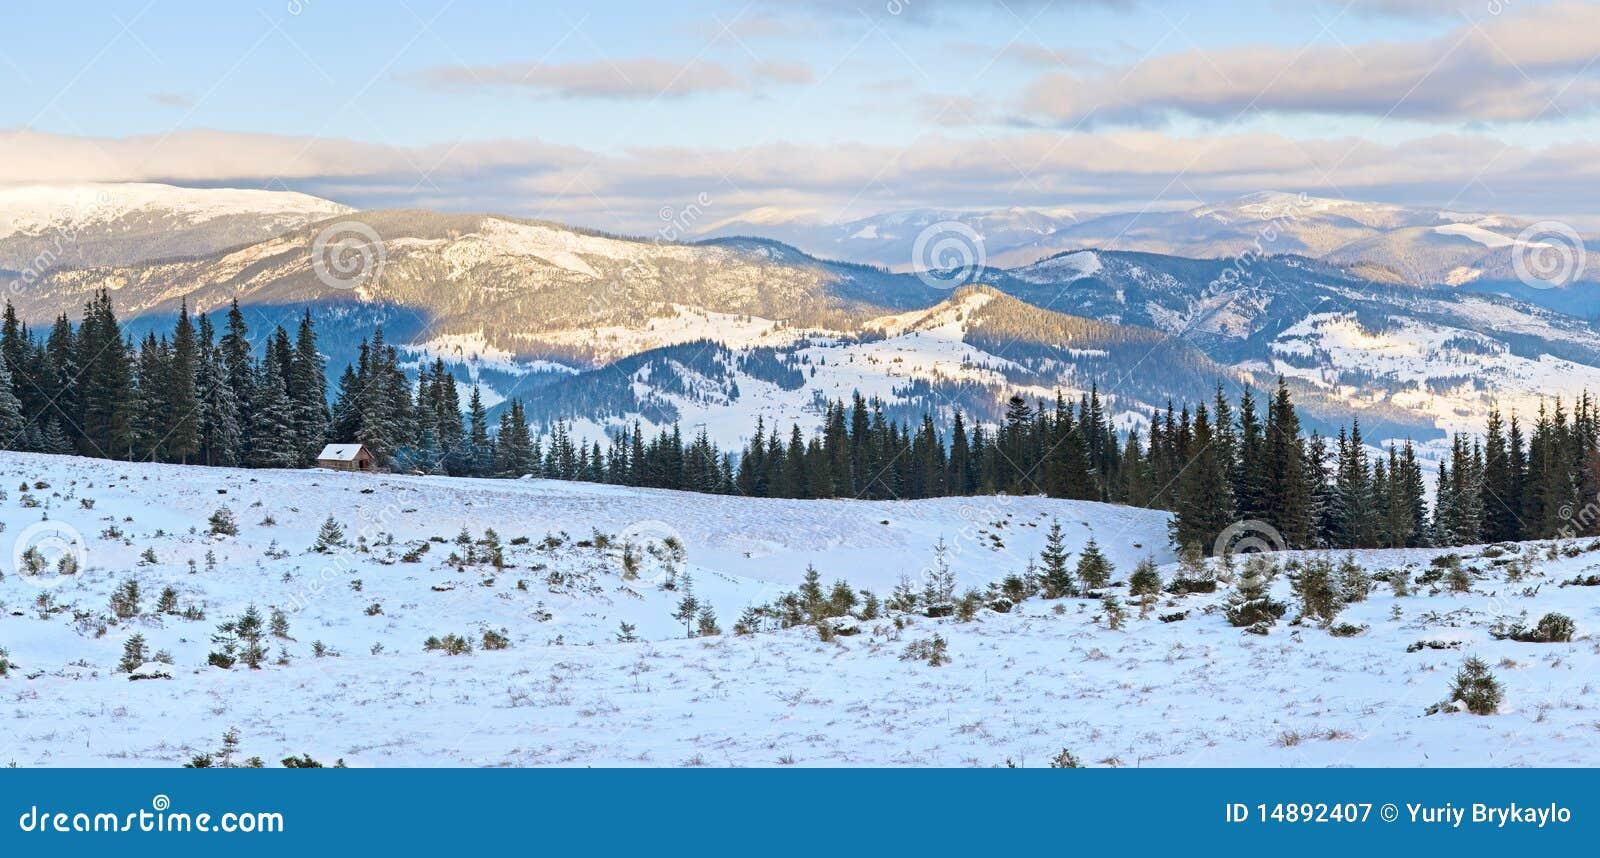 Winter Sunrise Mountain Landscape Royalty Free Stock